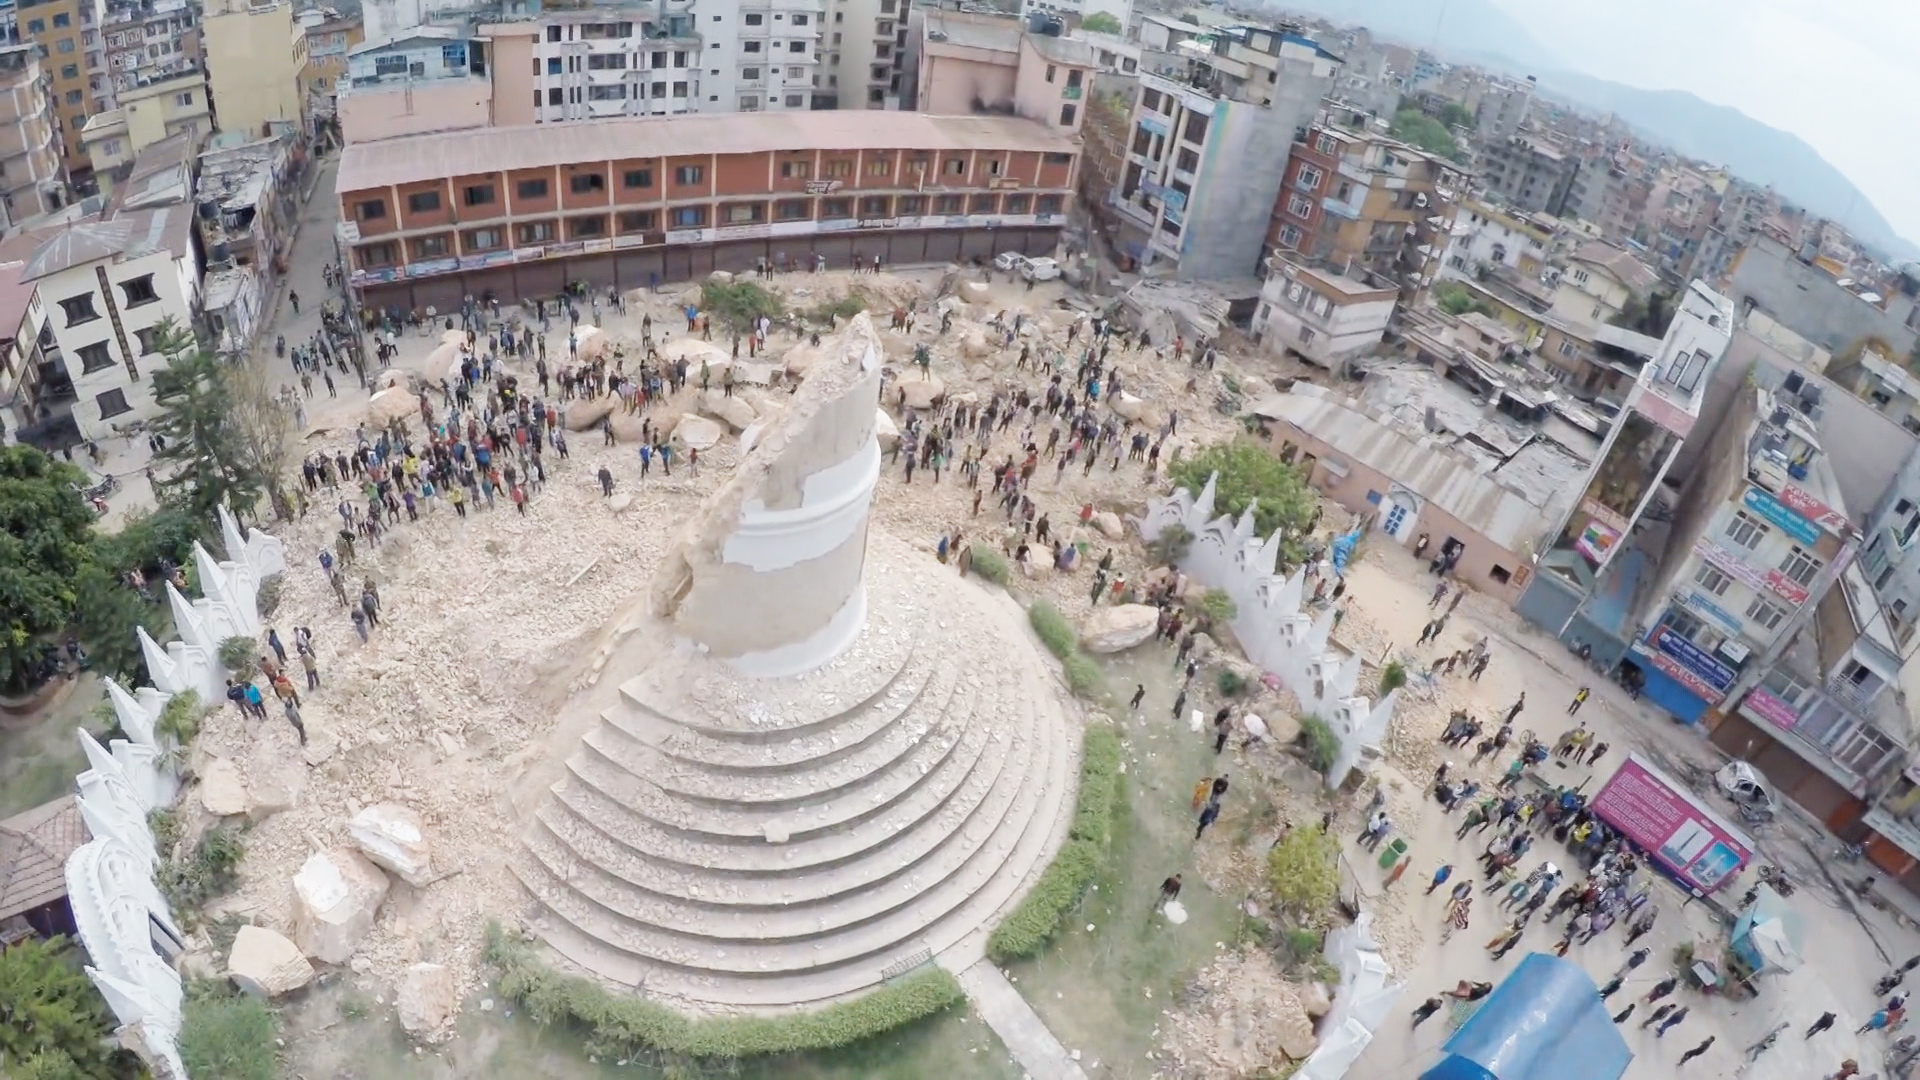 Nepal Earthquake: Shattered Historic Sites Foretell Long-Term Economic Impact